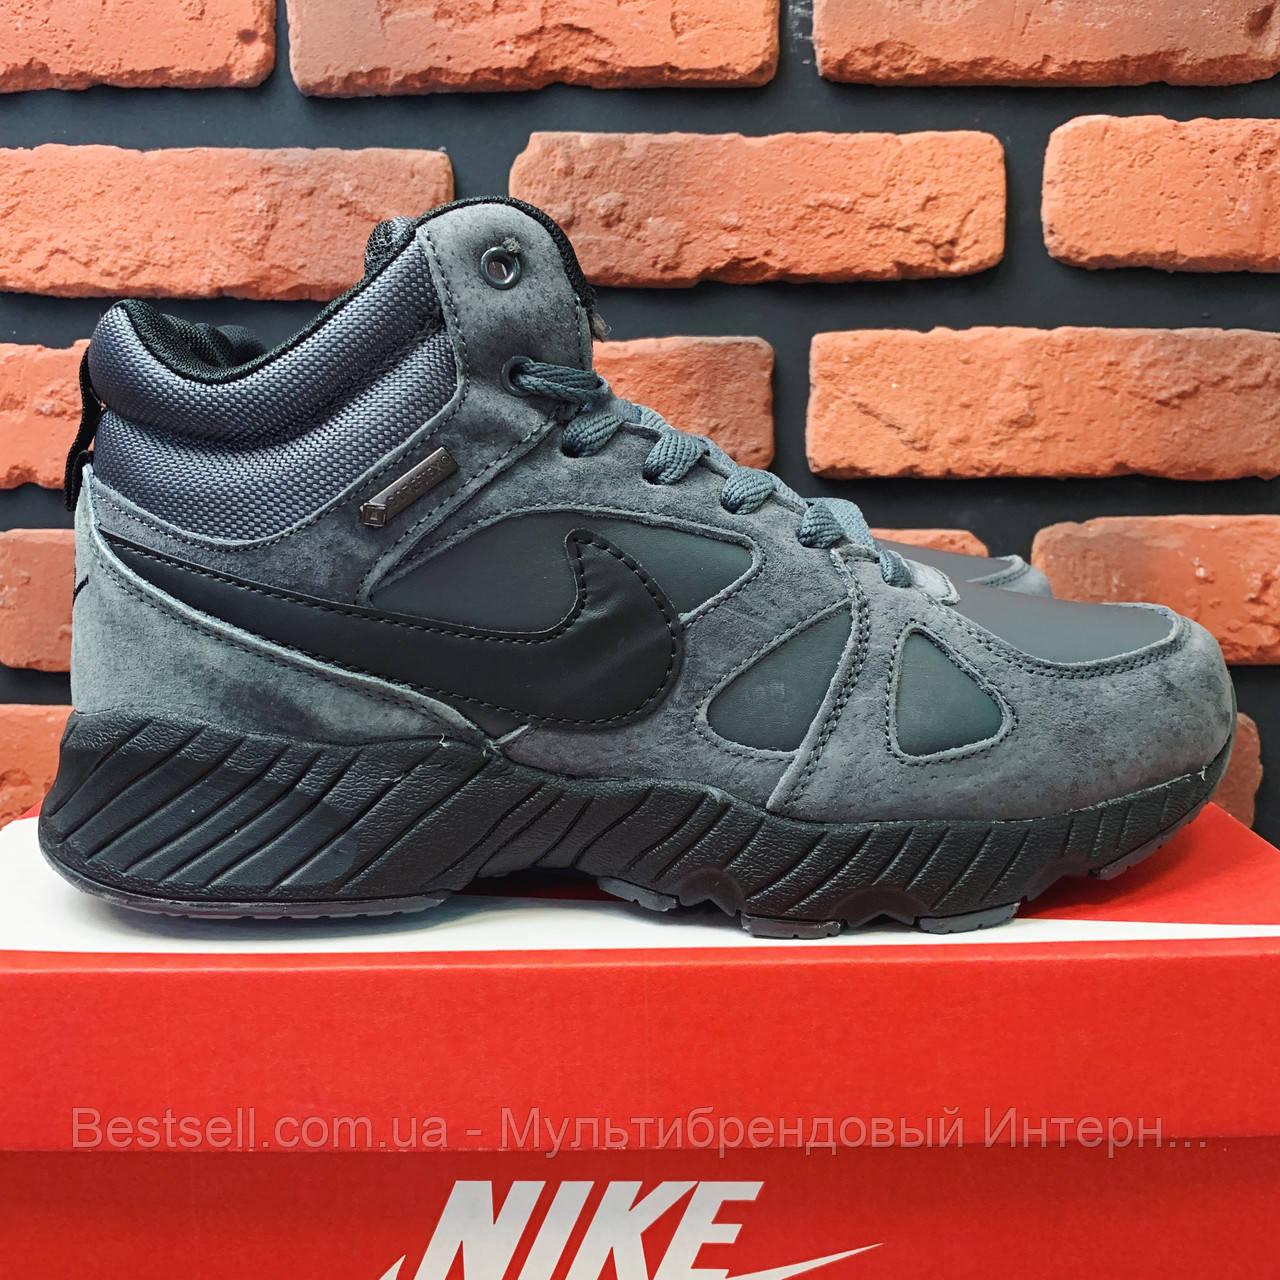 Зимние ботинки (на меху) Nike Air Max  1-087 ⏩ [ 43,44,45 ]